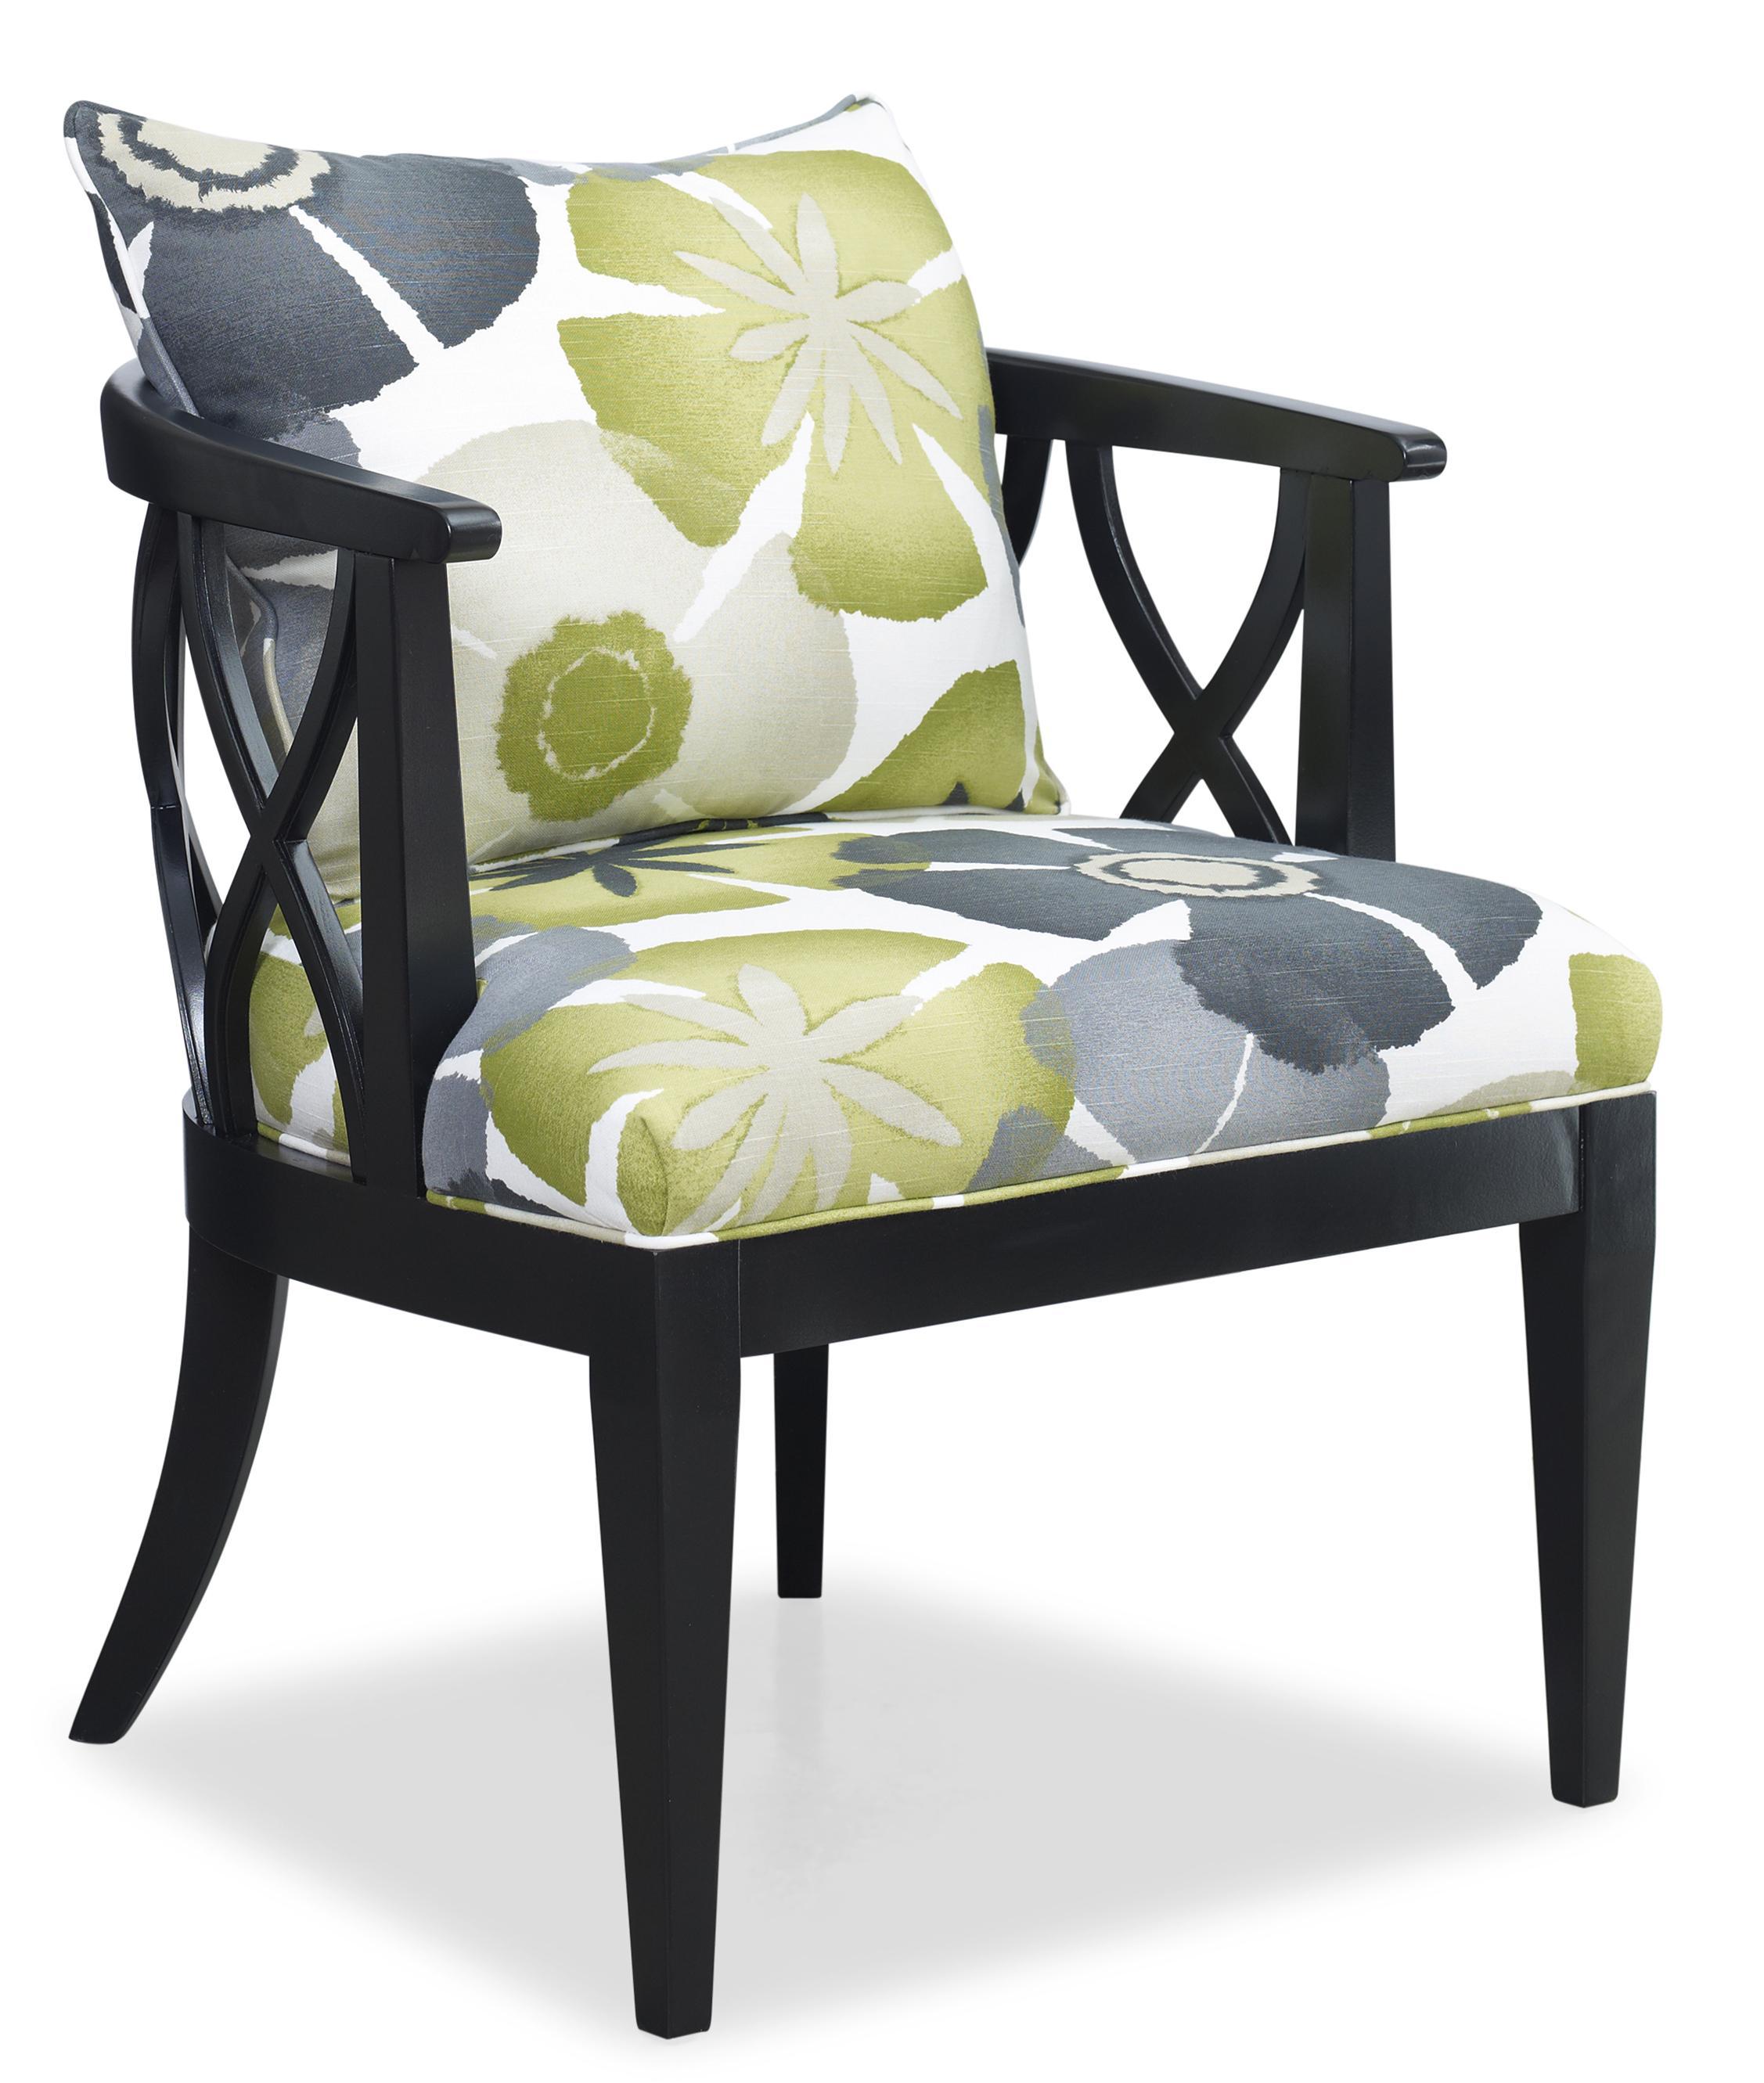 High Quality Sam Moore VeronaCarved Wood Chair ...